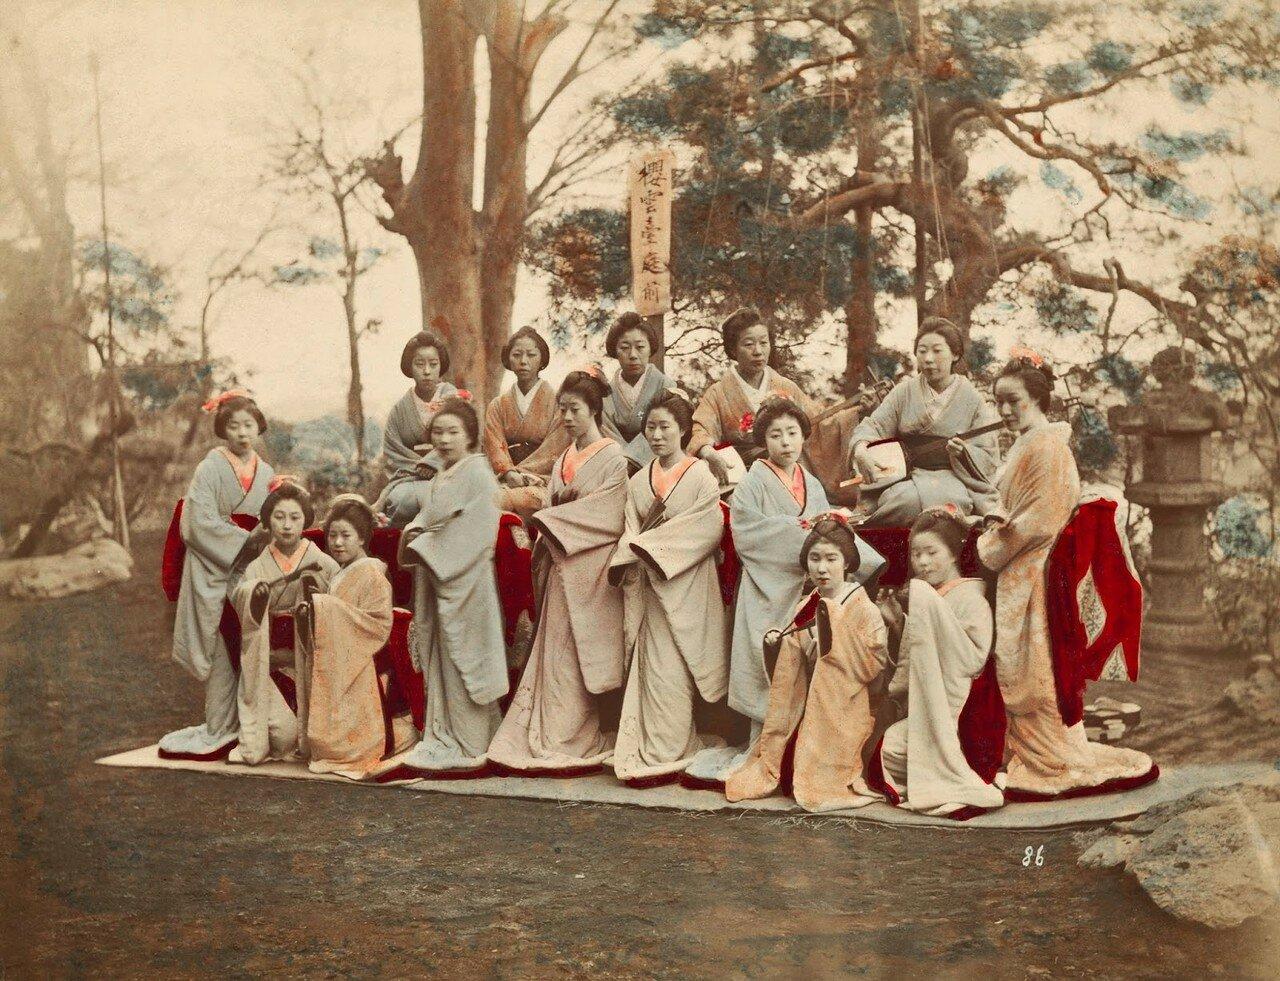 Танцовщицы и музыканты. 1870-е.